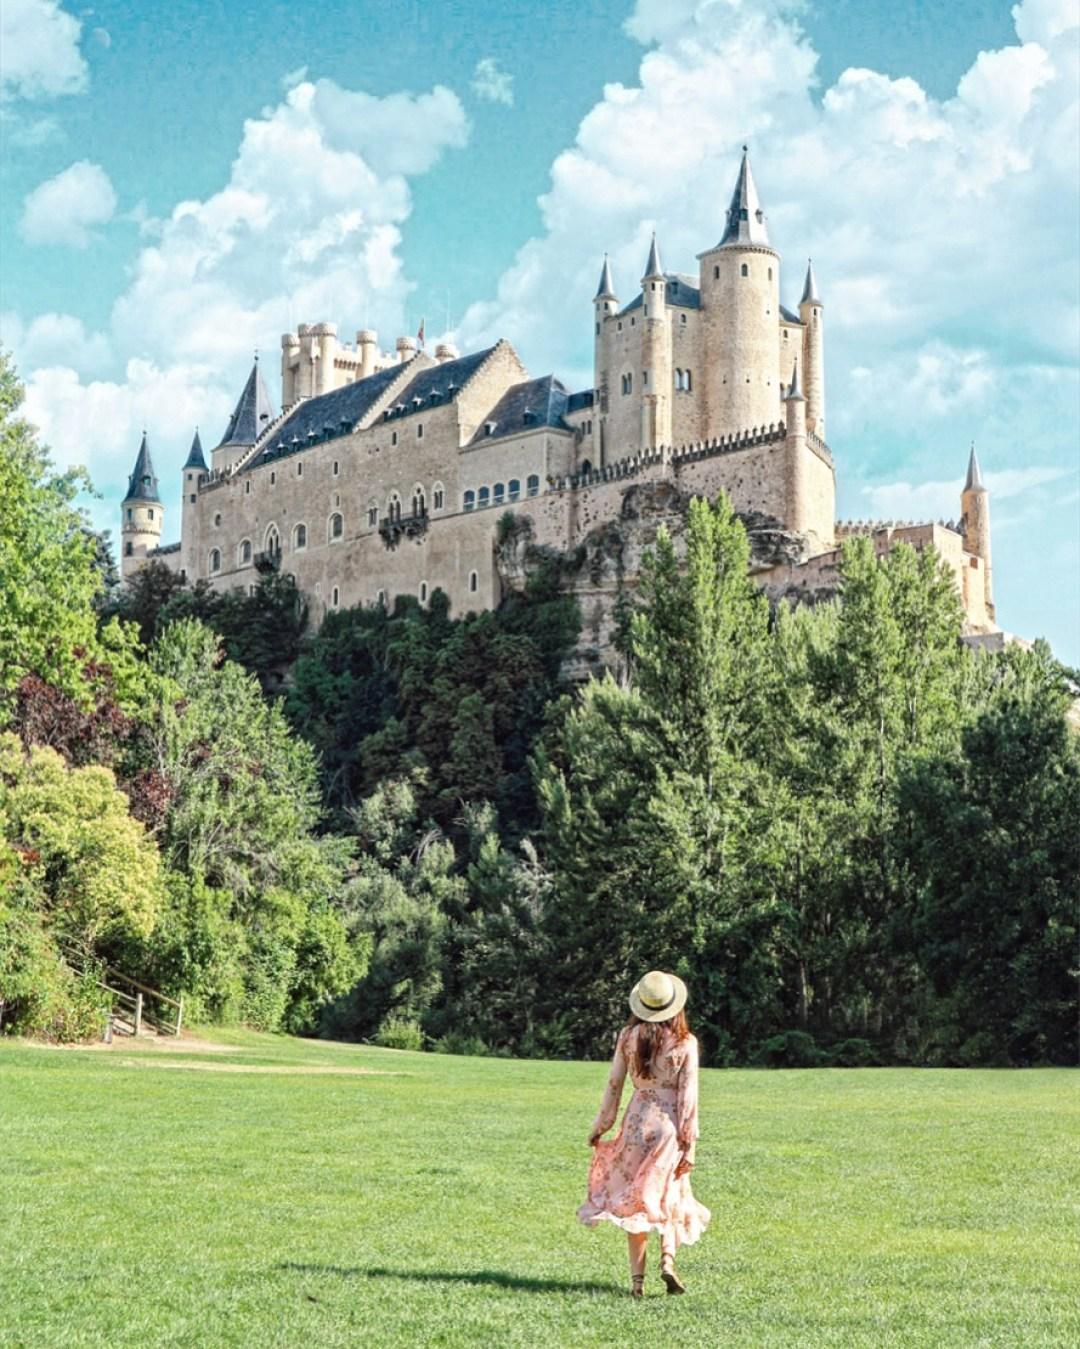 10 Reasons To Visit Segovia, Spain